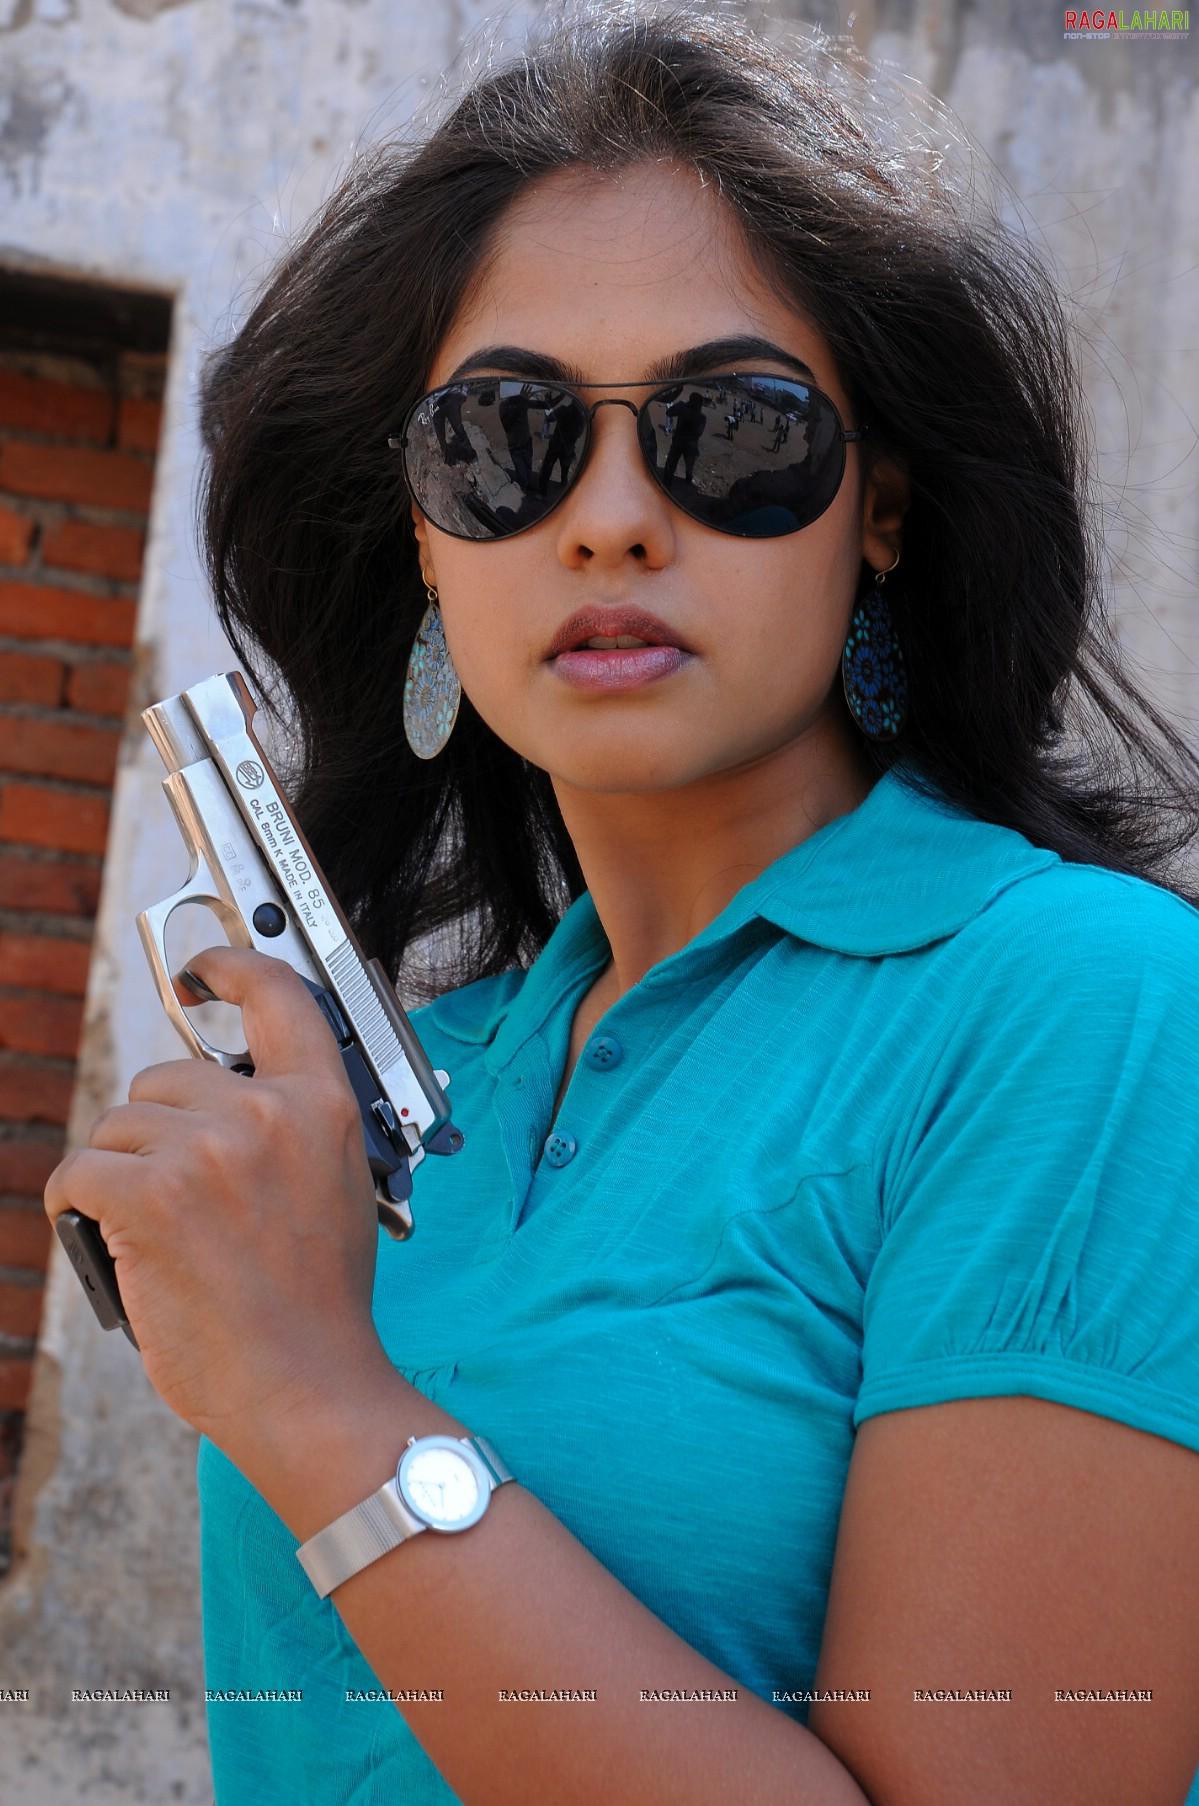 Bindu Madhavi claims Similarities with Silk